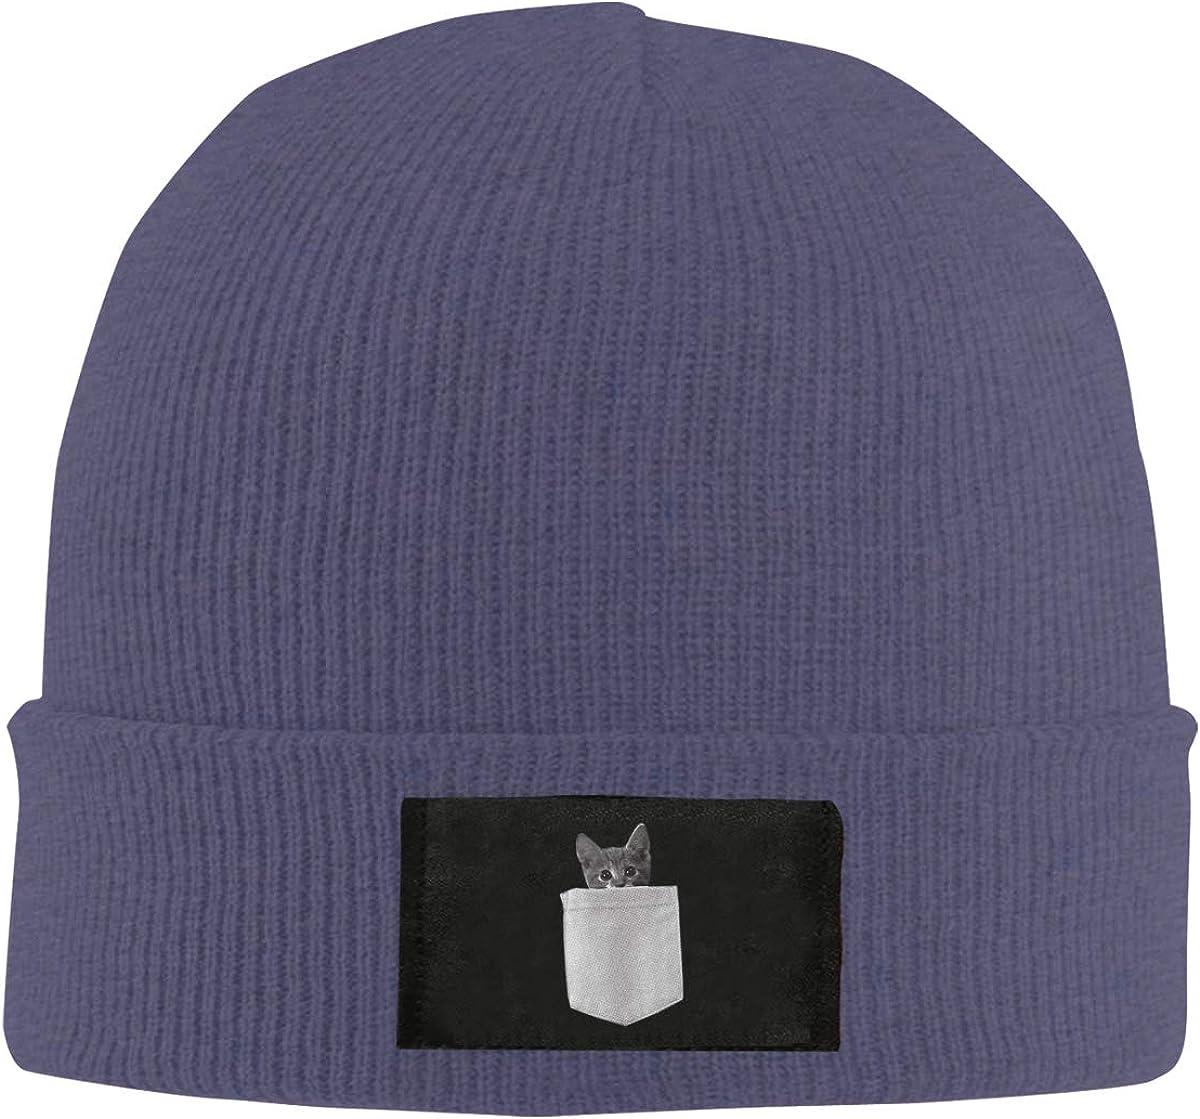 Unisex Stylish Slouch Beanie Hats Black NWPYAU Top Level Beanie Men Women